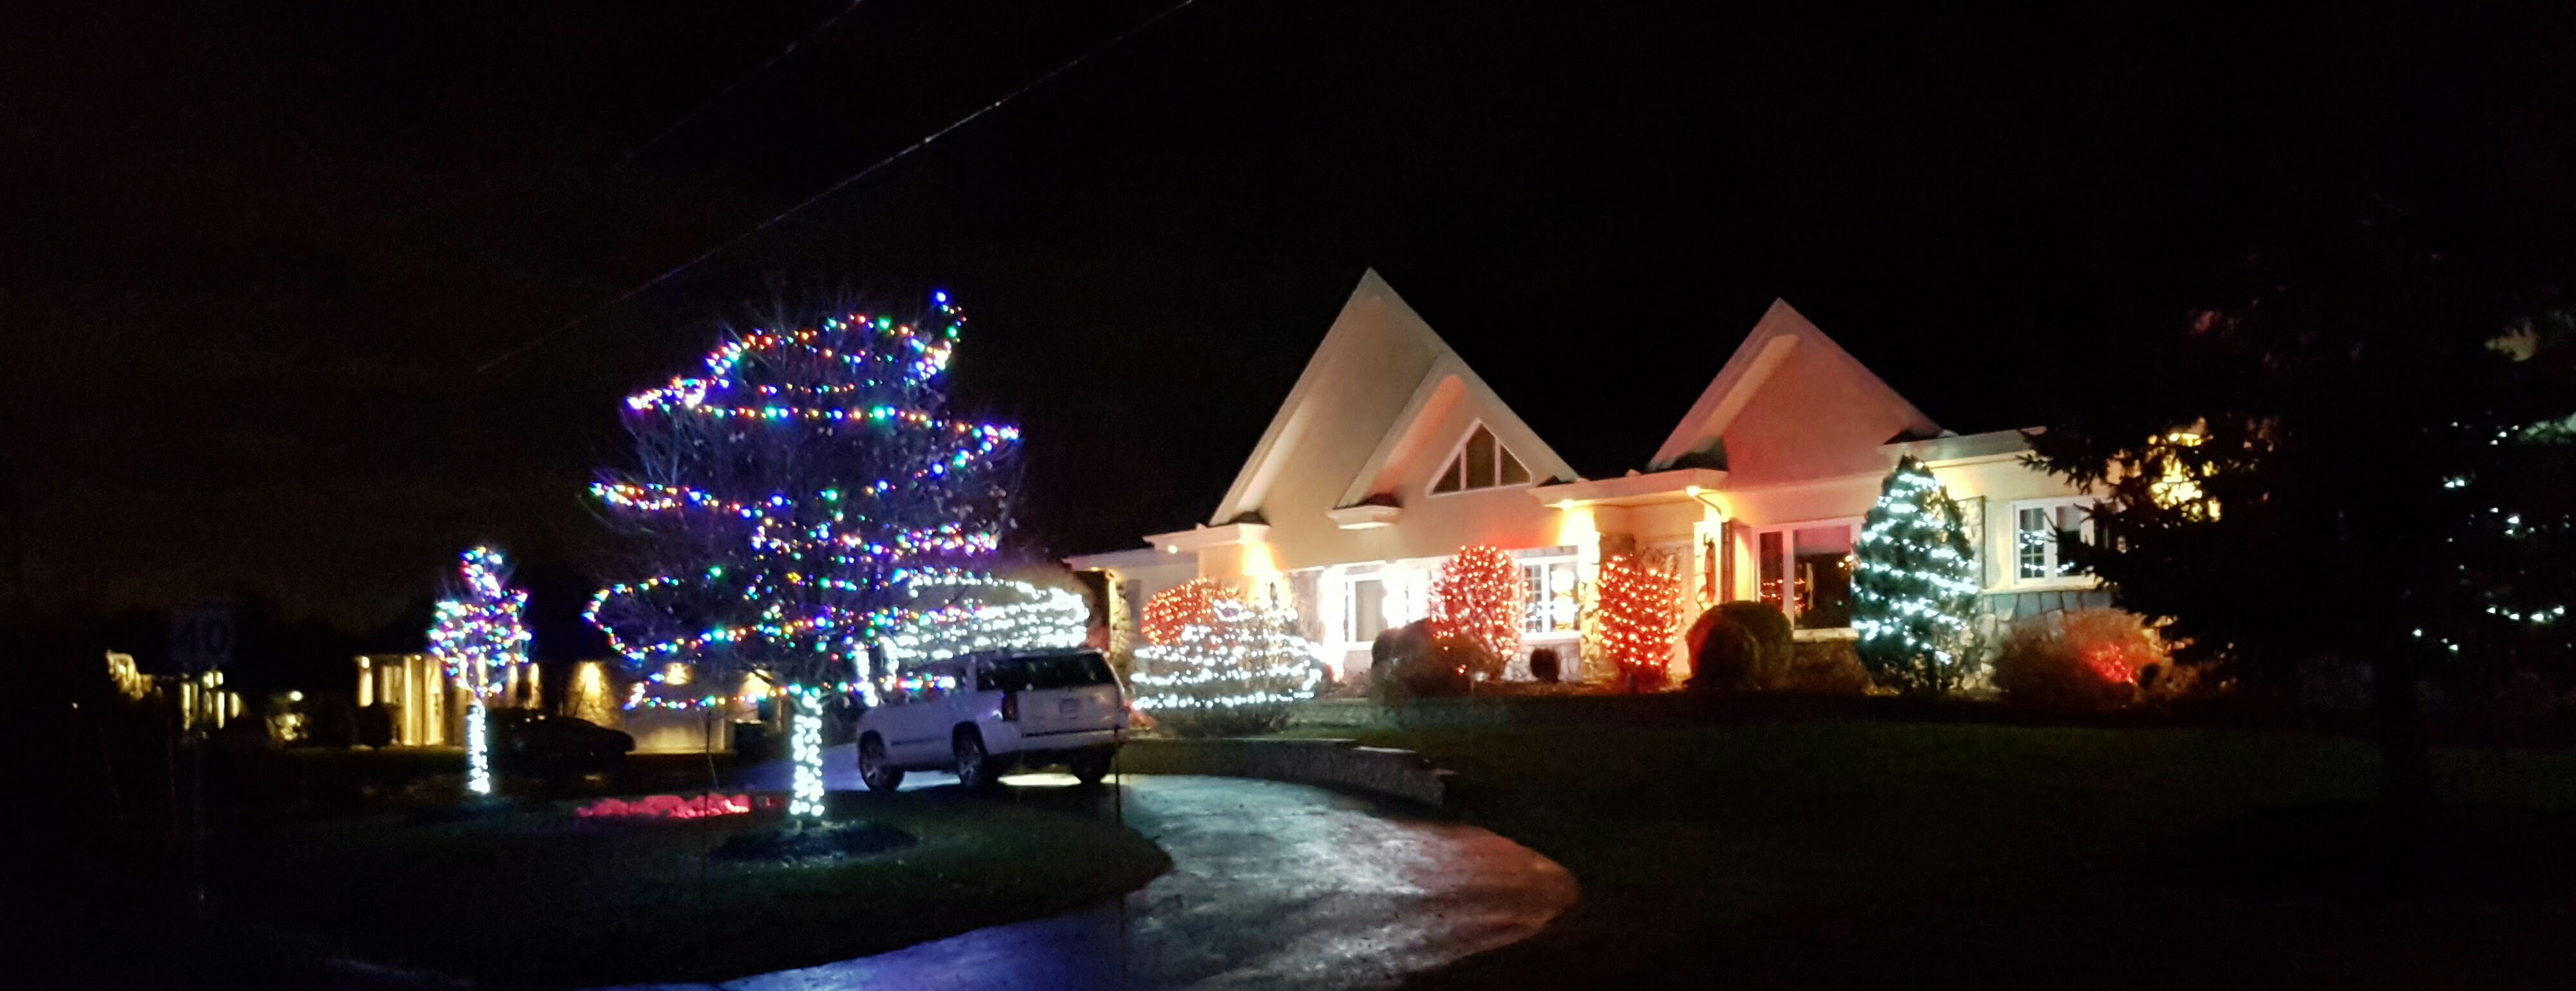 house_trees_lighting